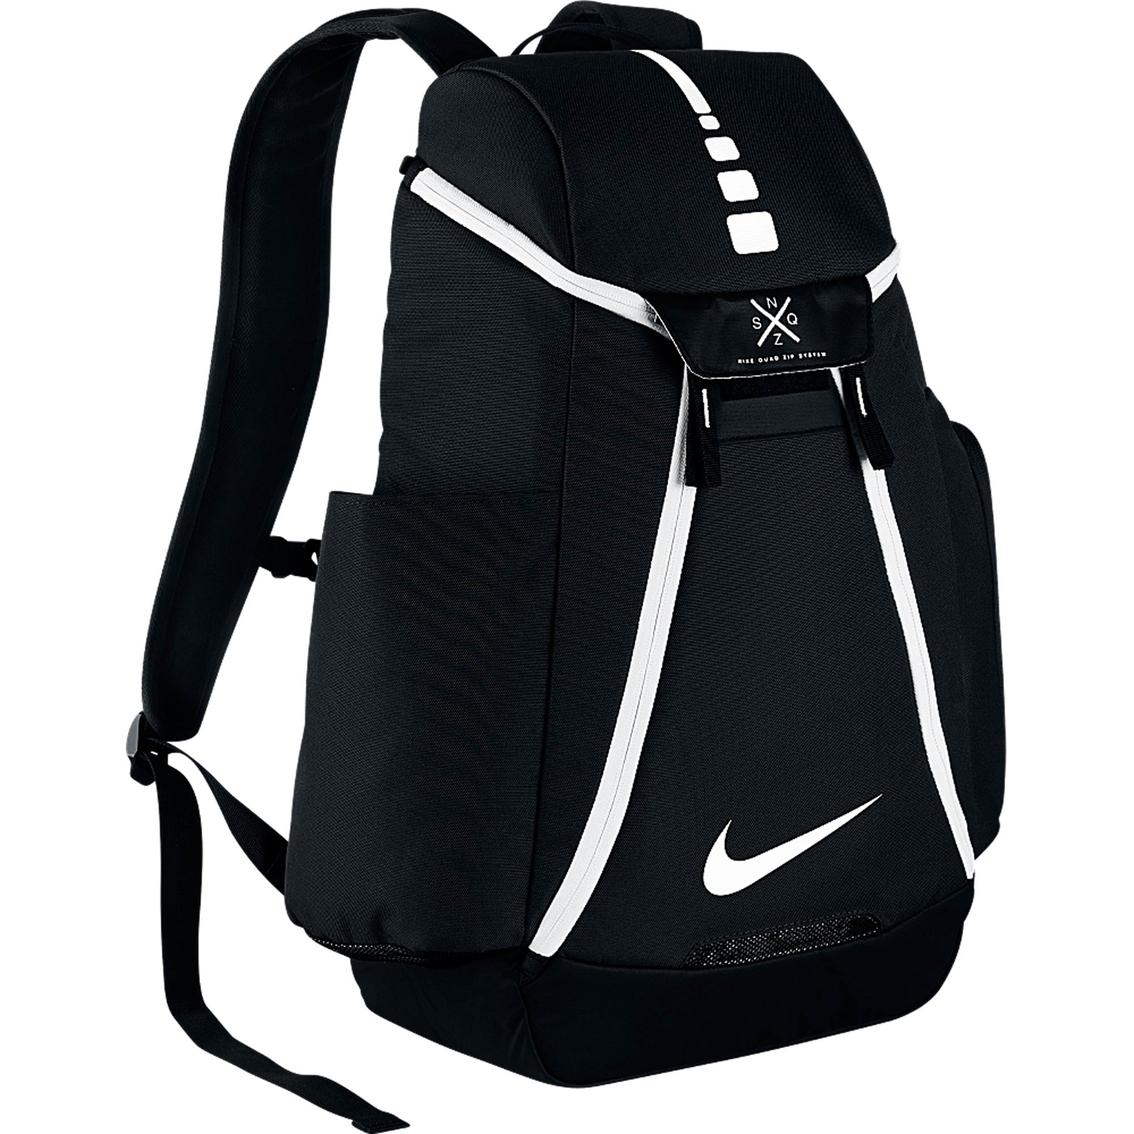 337f327ca4 Nike Hoops Elite Max Air Team Backpack | Backpacks | More | Shop The ...